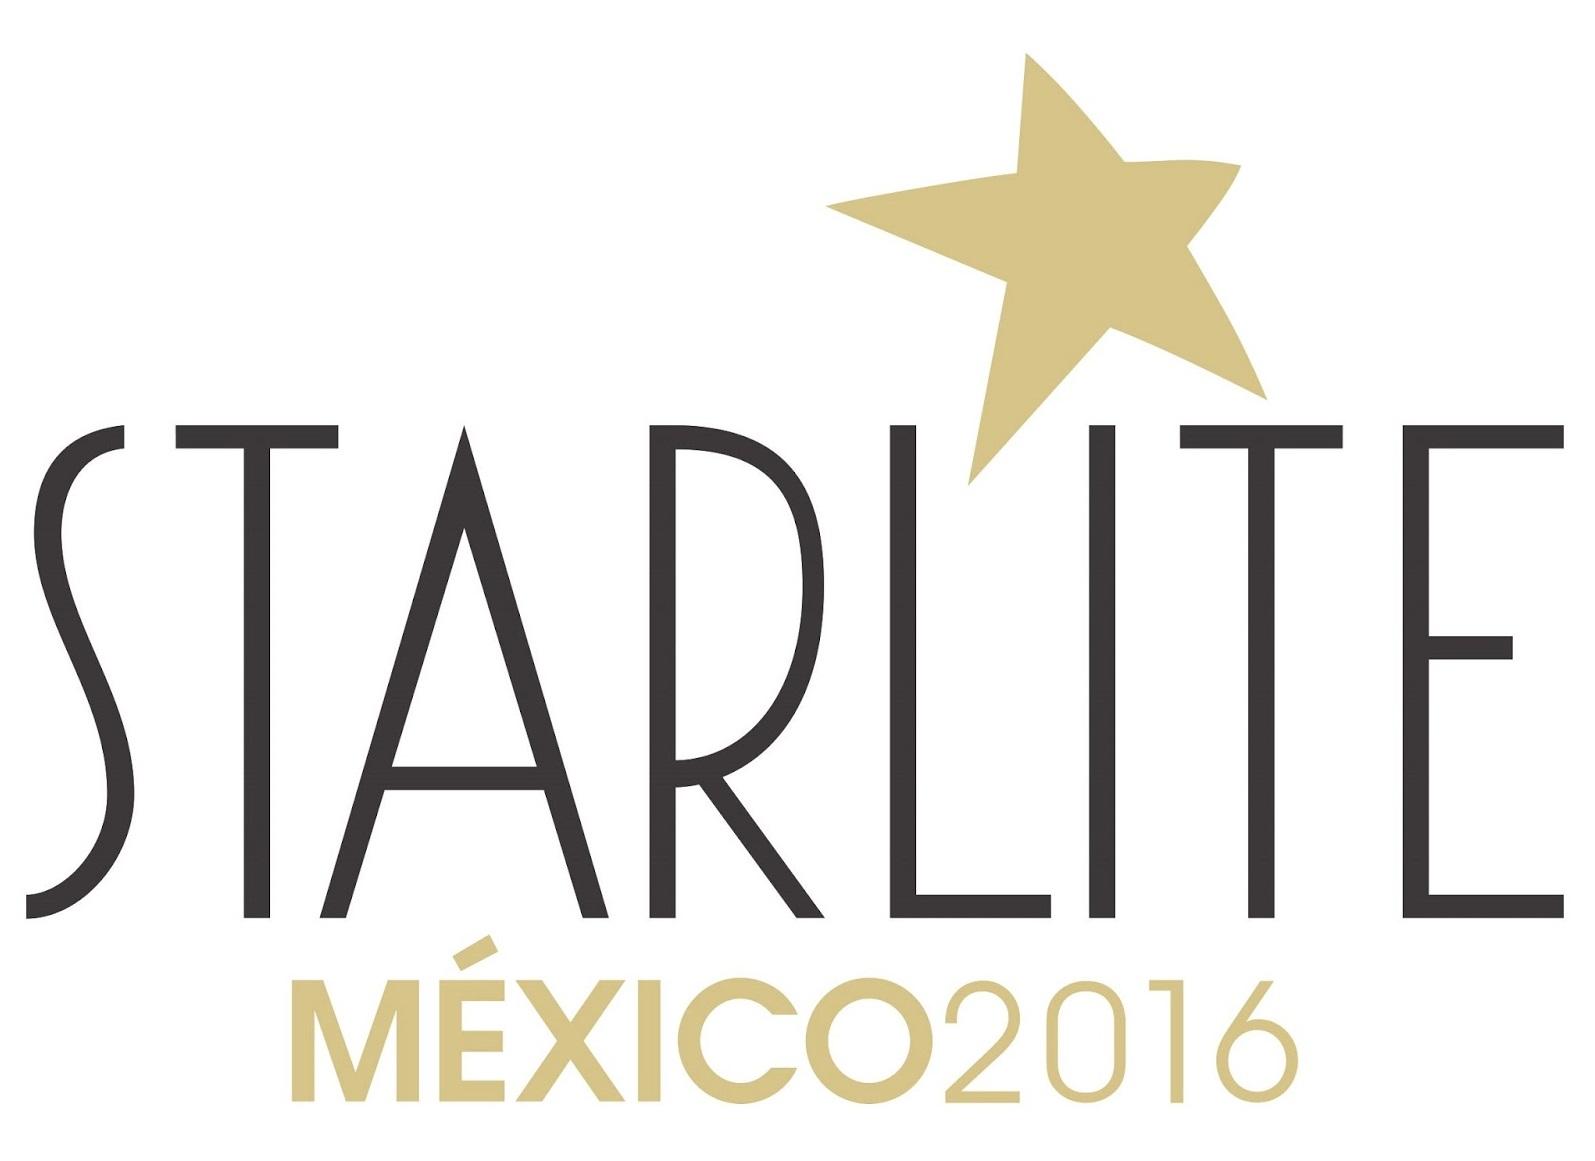 Photo of Starlite Festival 2016